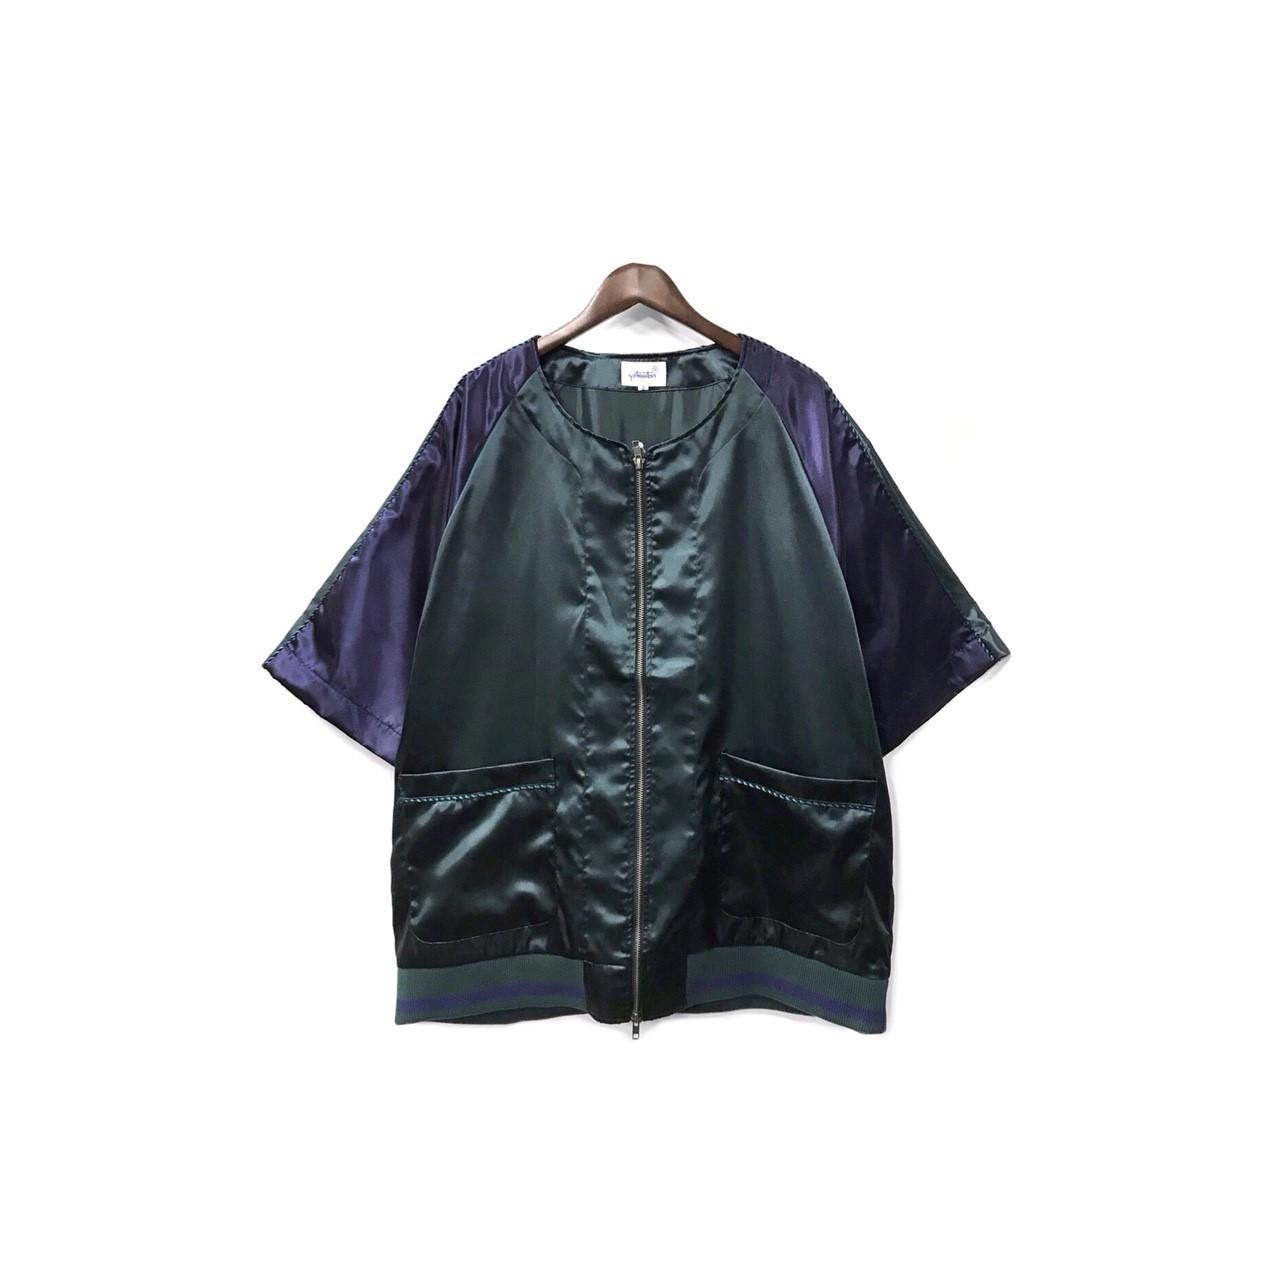 yotsuba - Souvenir baseball Shirt / Green ¥26000+tax